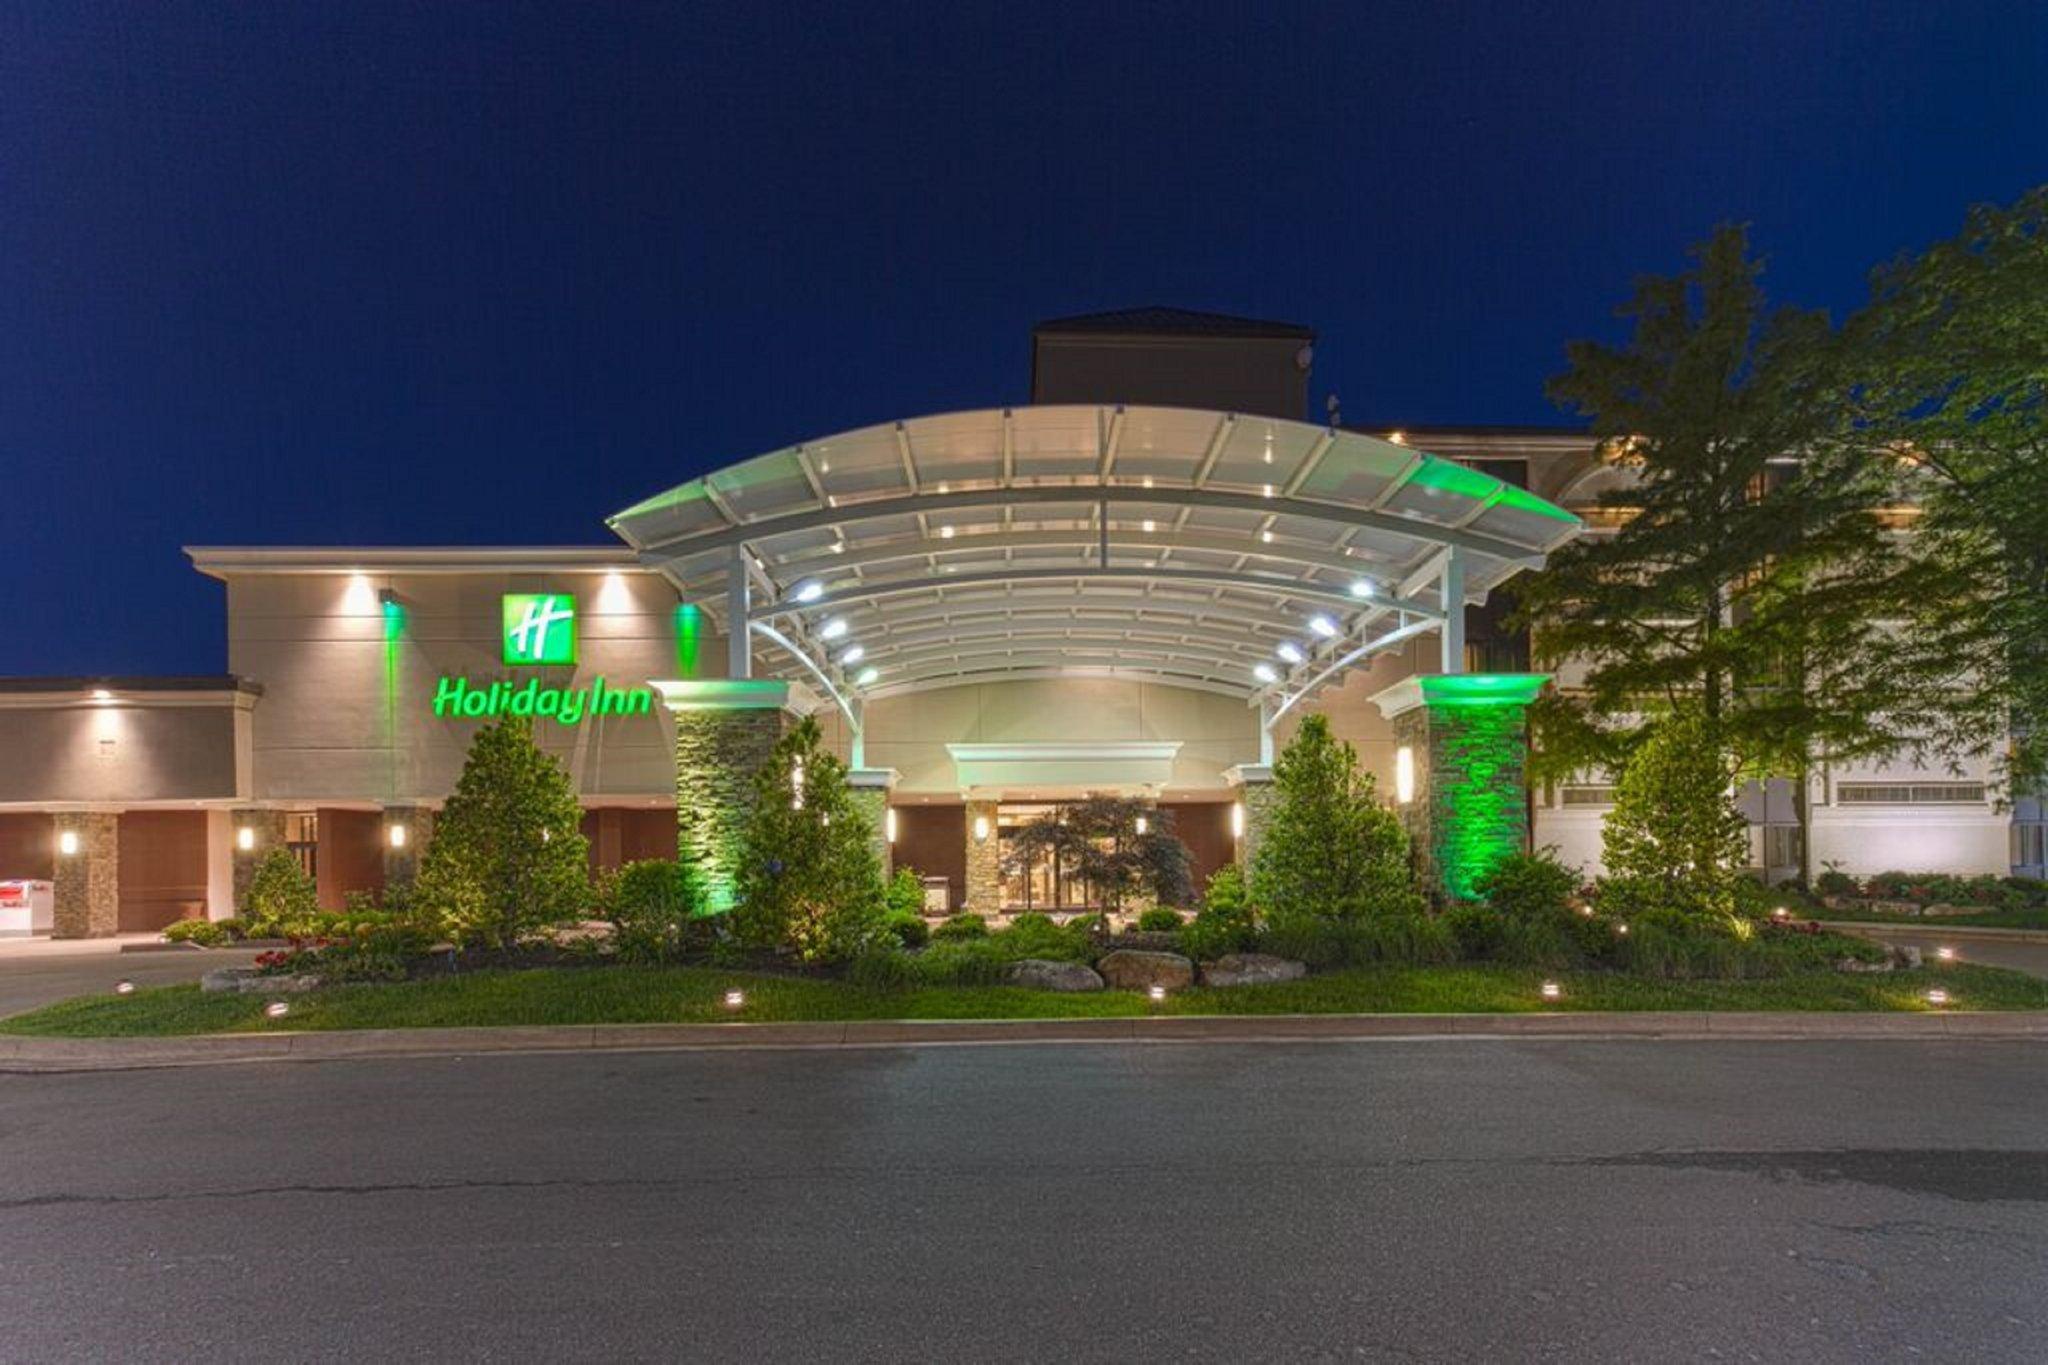 Holiday Inn Executive Center Hotel